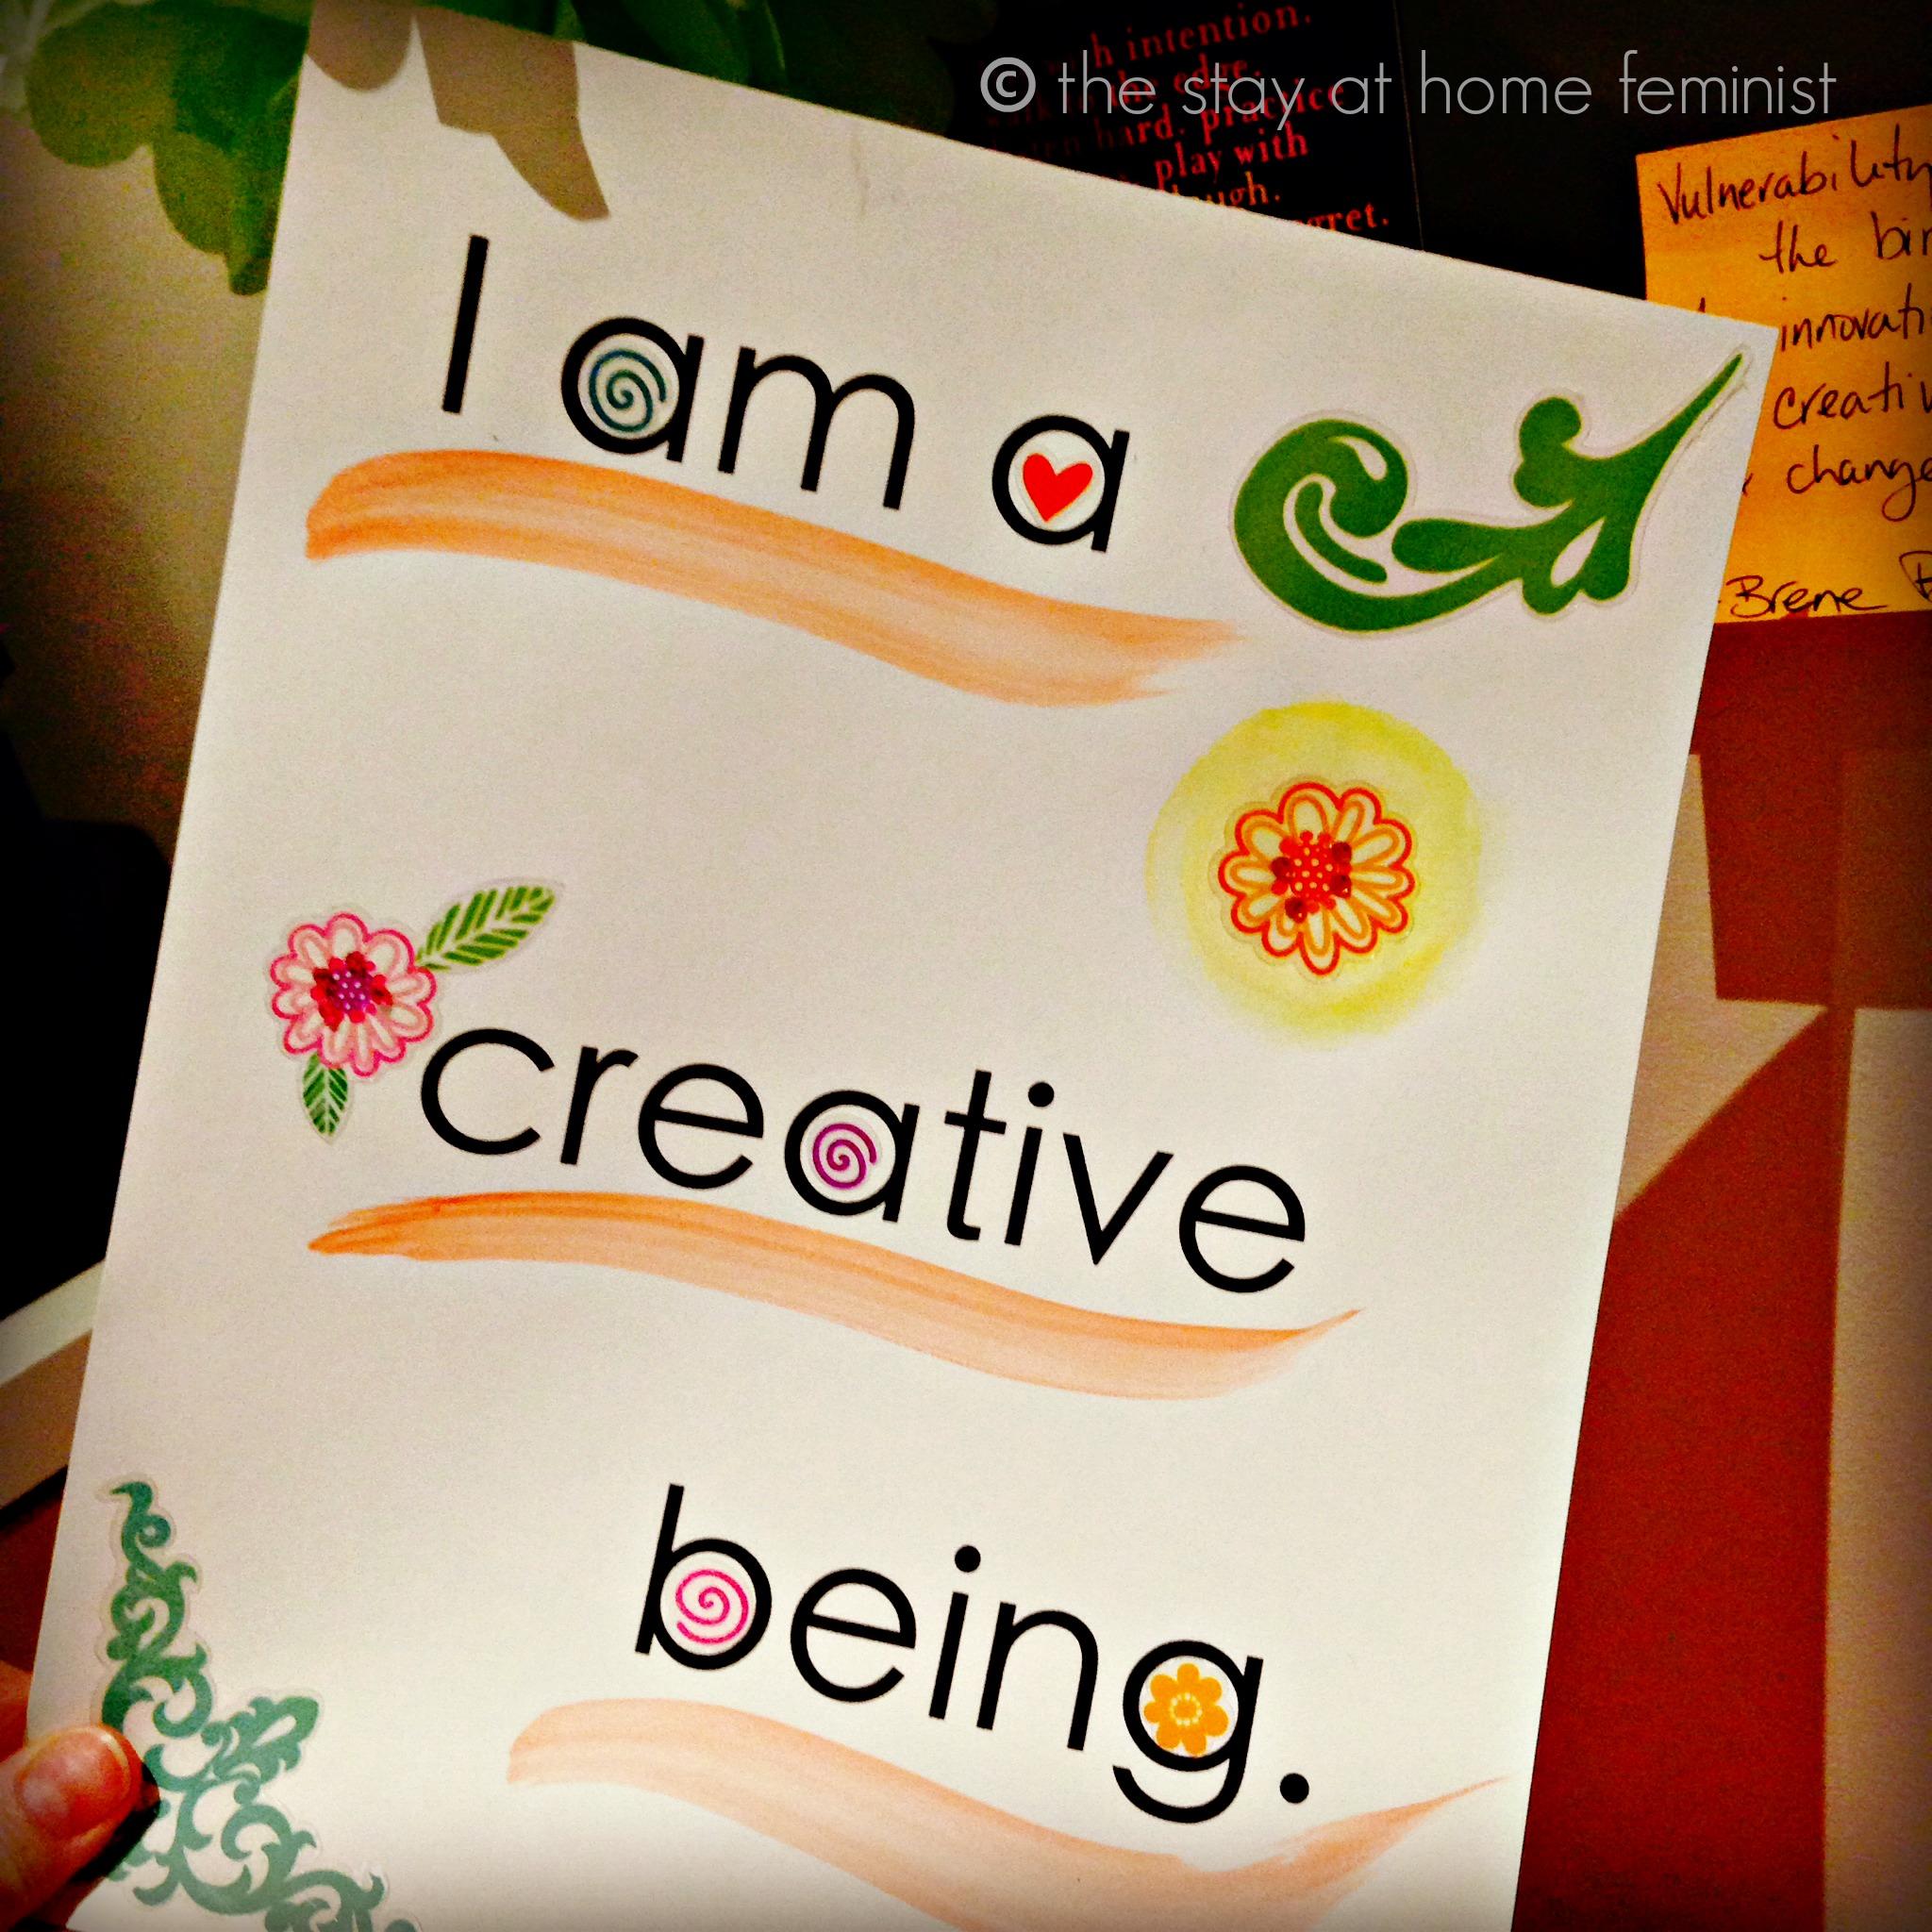 creativebeing